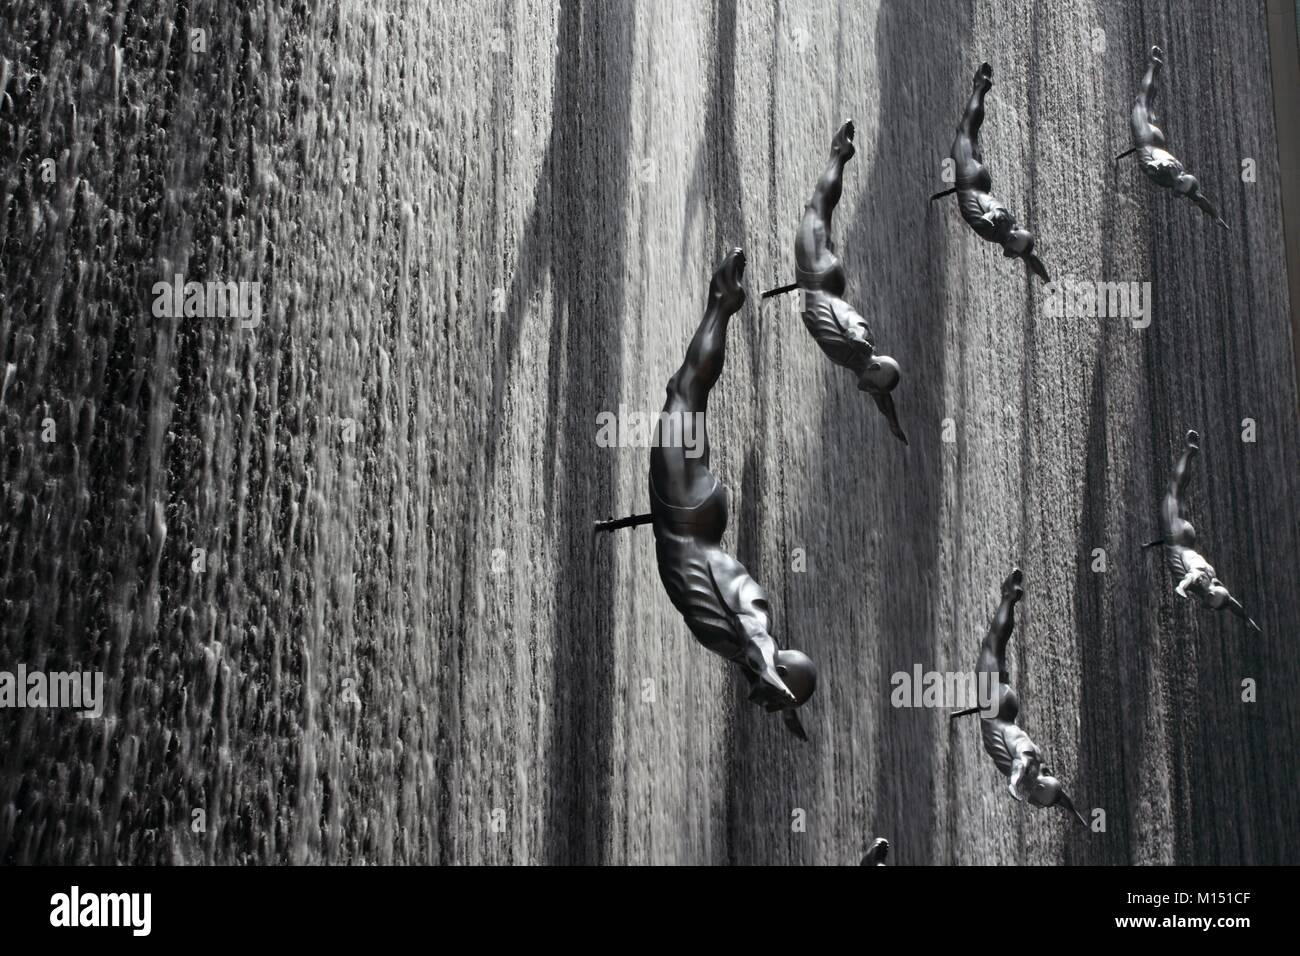 Los Emiratos Árabes Unidos, Dubai, Dubai Mall, la cascada Imagen De Stock